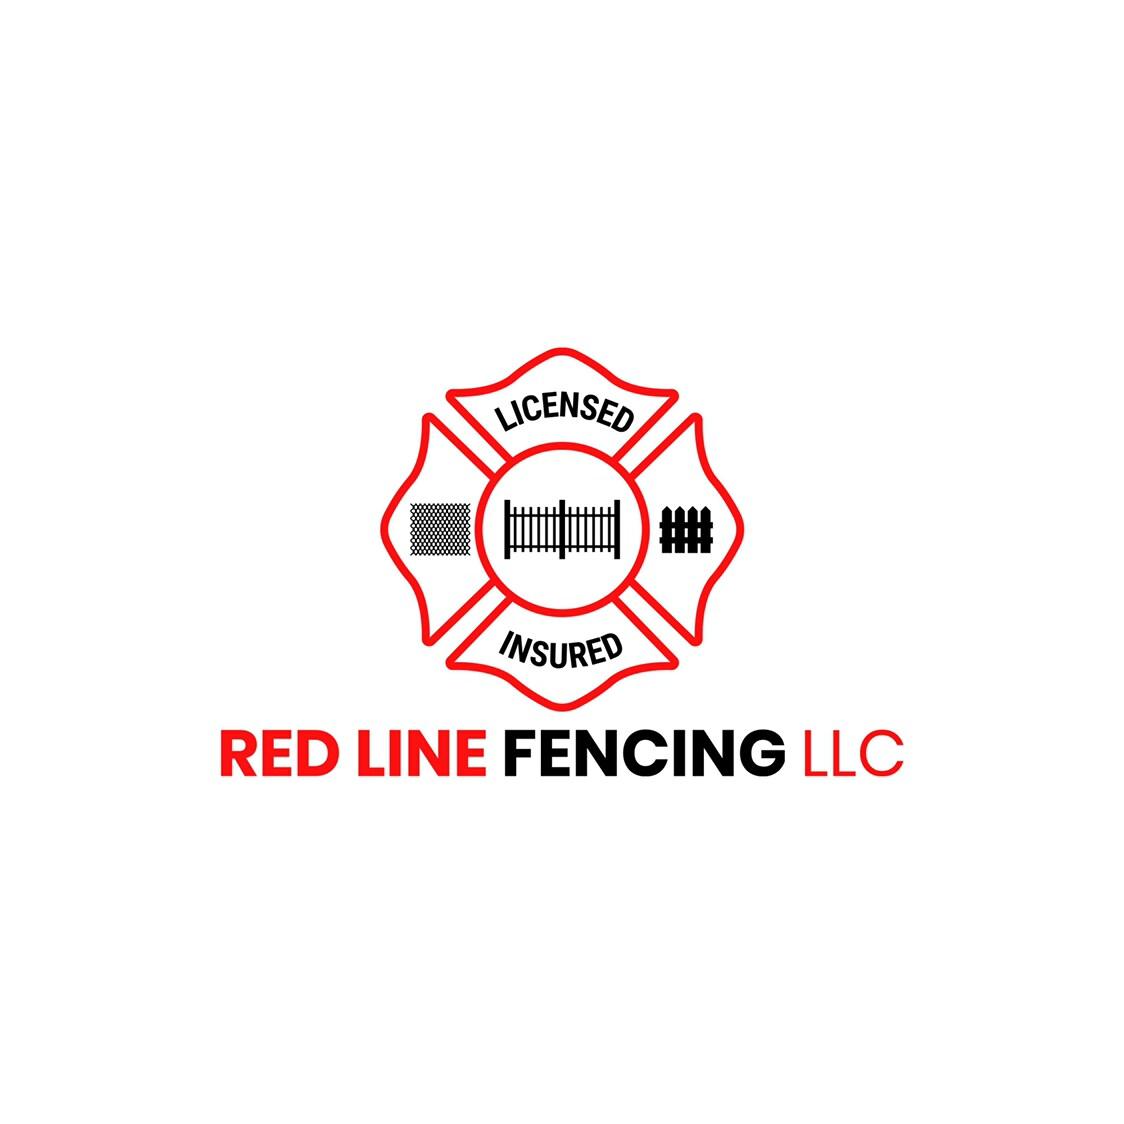 Red Line Fencing LLC